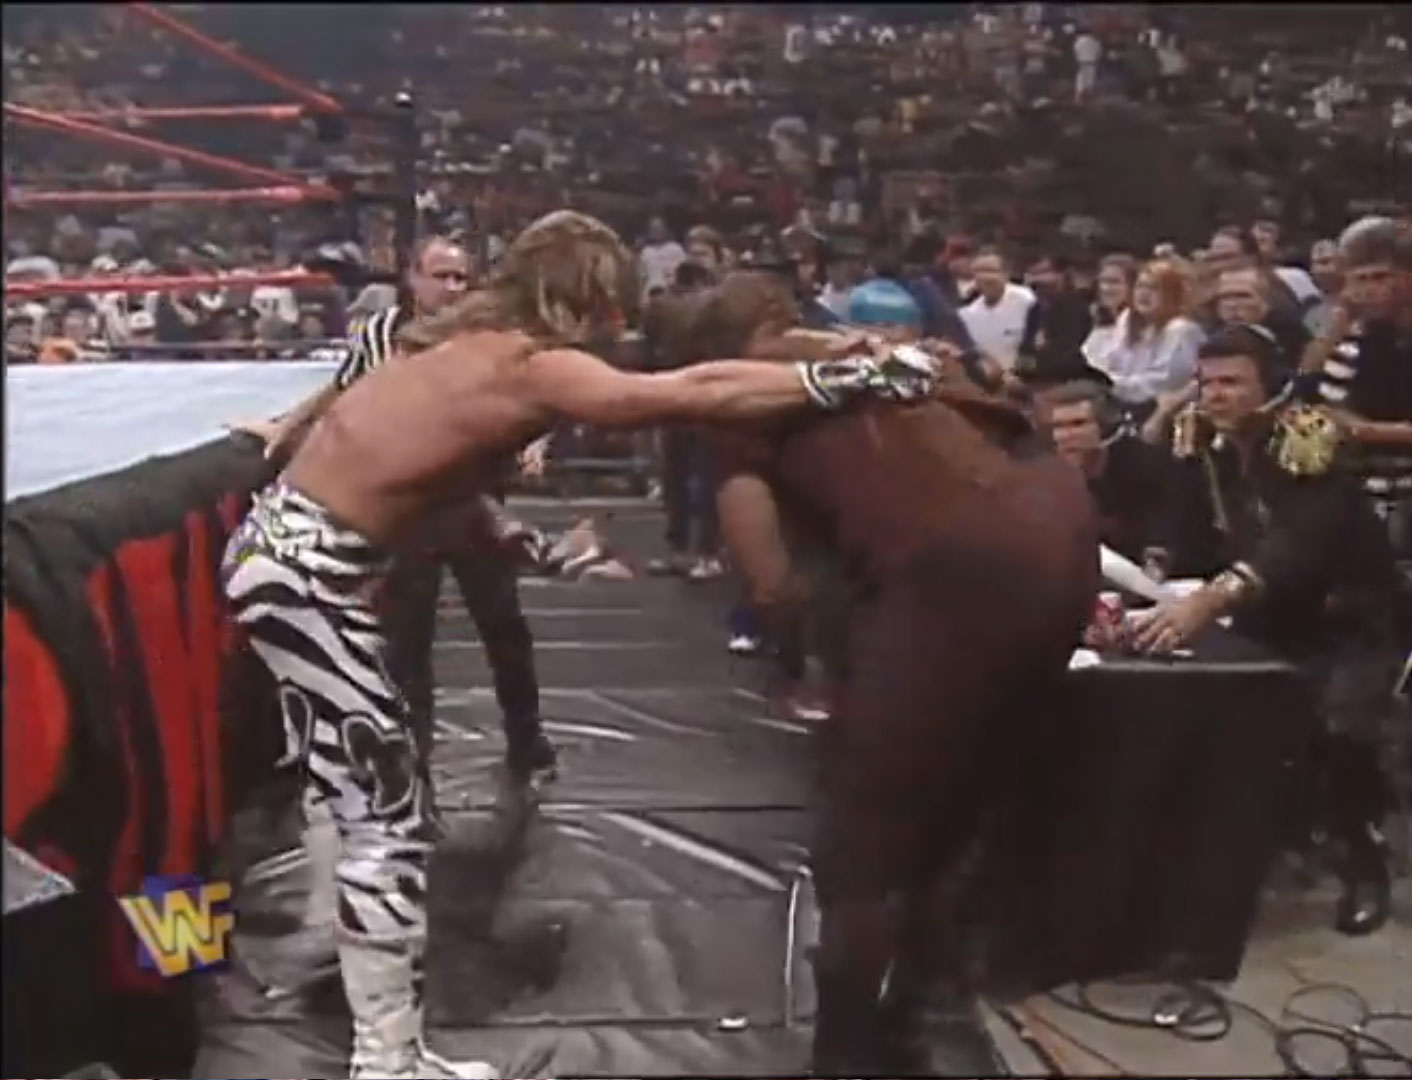 Shawn Michaels vs. Mankind WWF Monday Night RAW Aug 11th 1997